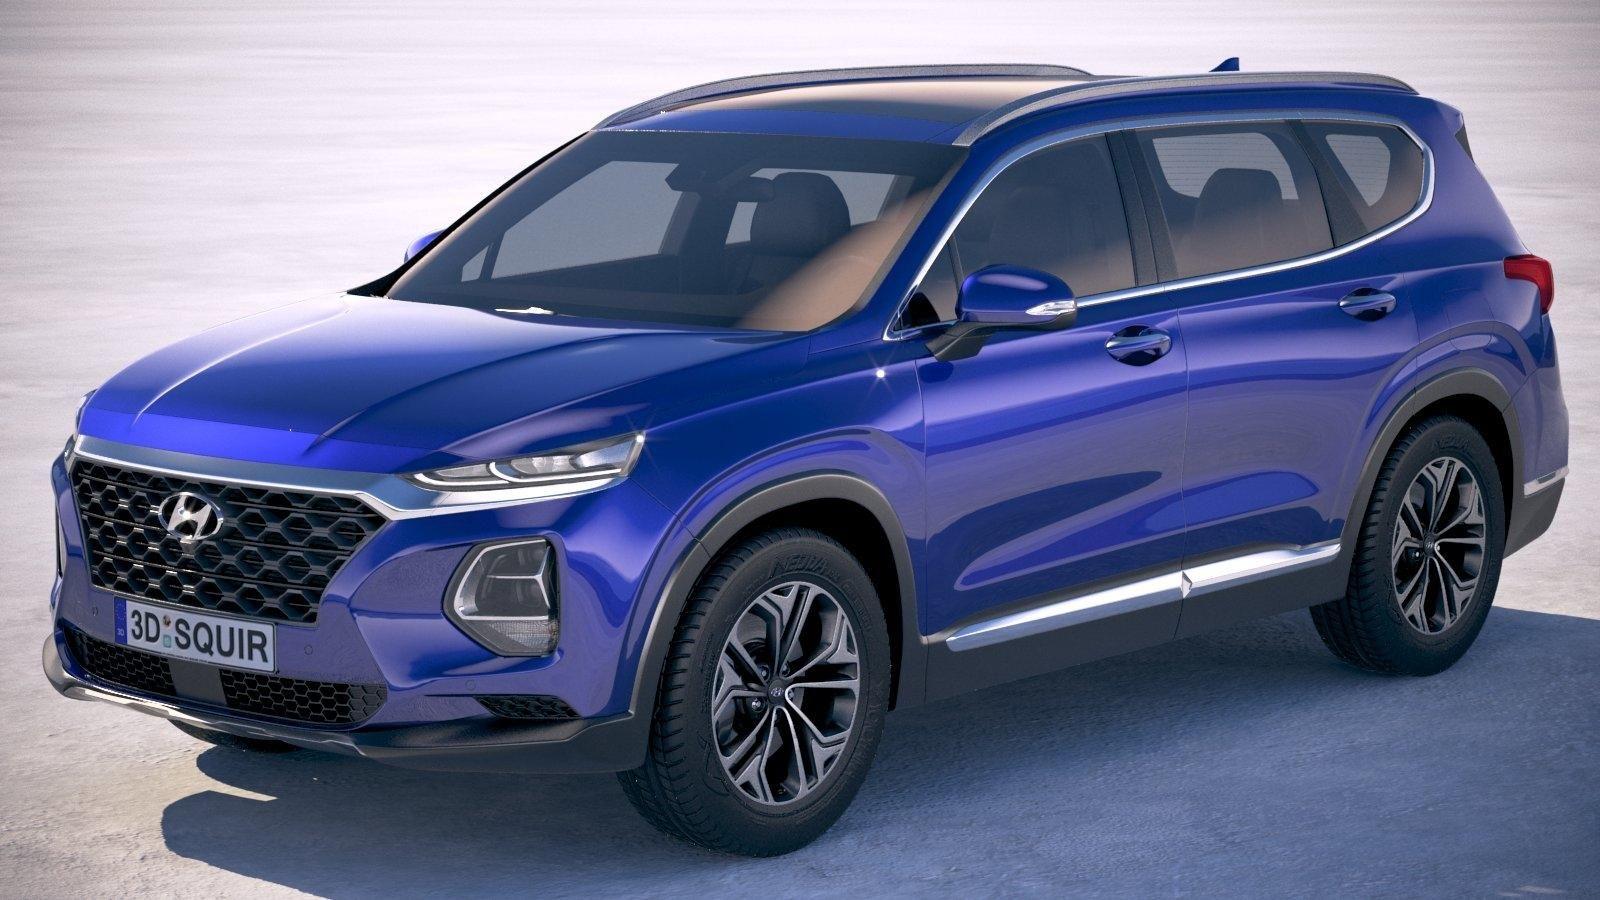 Hyundai SantaFe 2019 3D Model AD ,SantaFeHyundaiModel